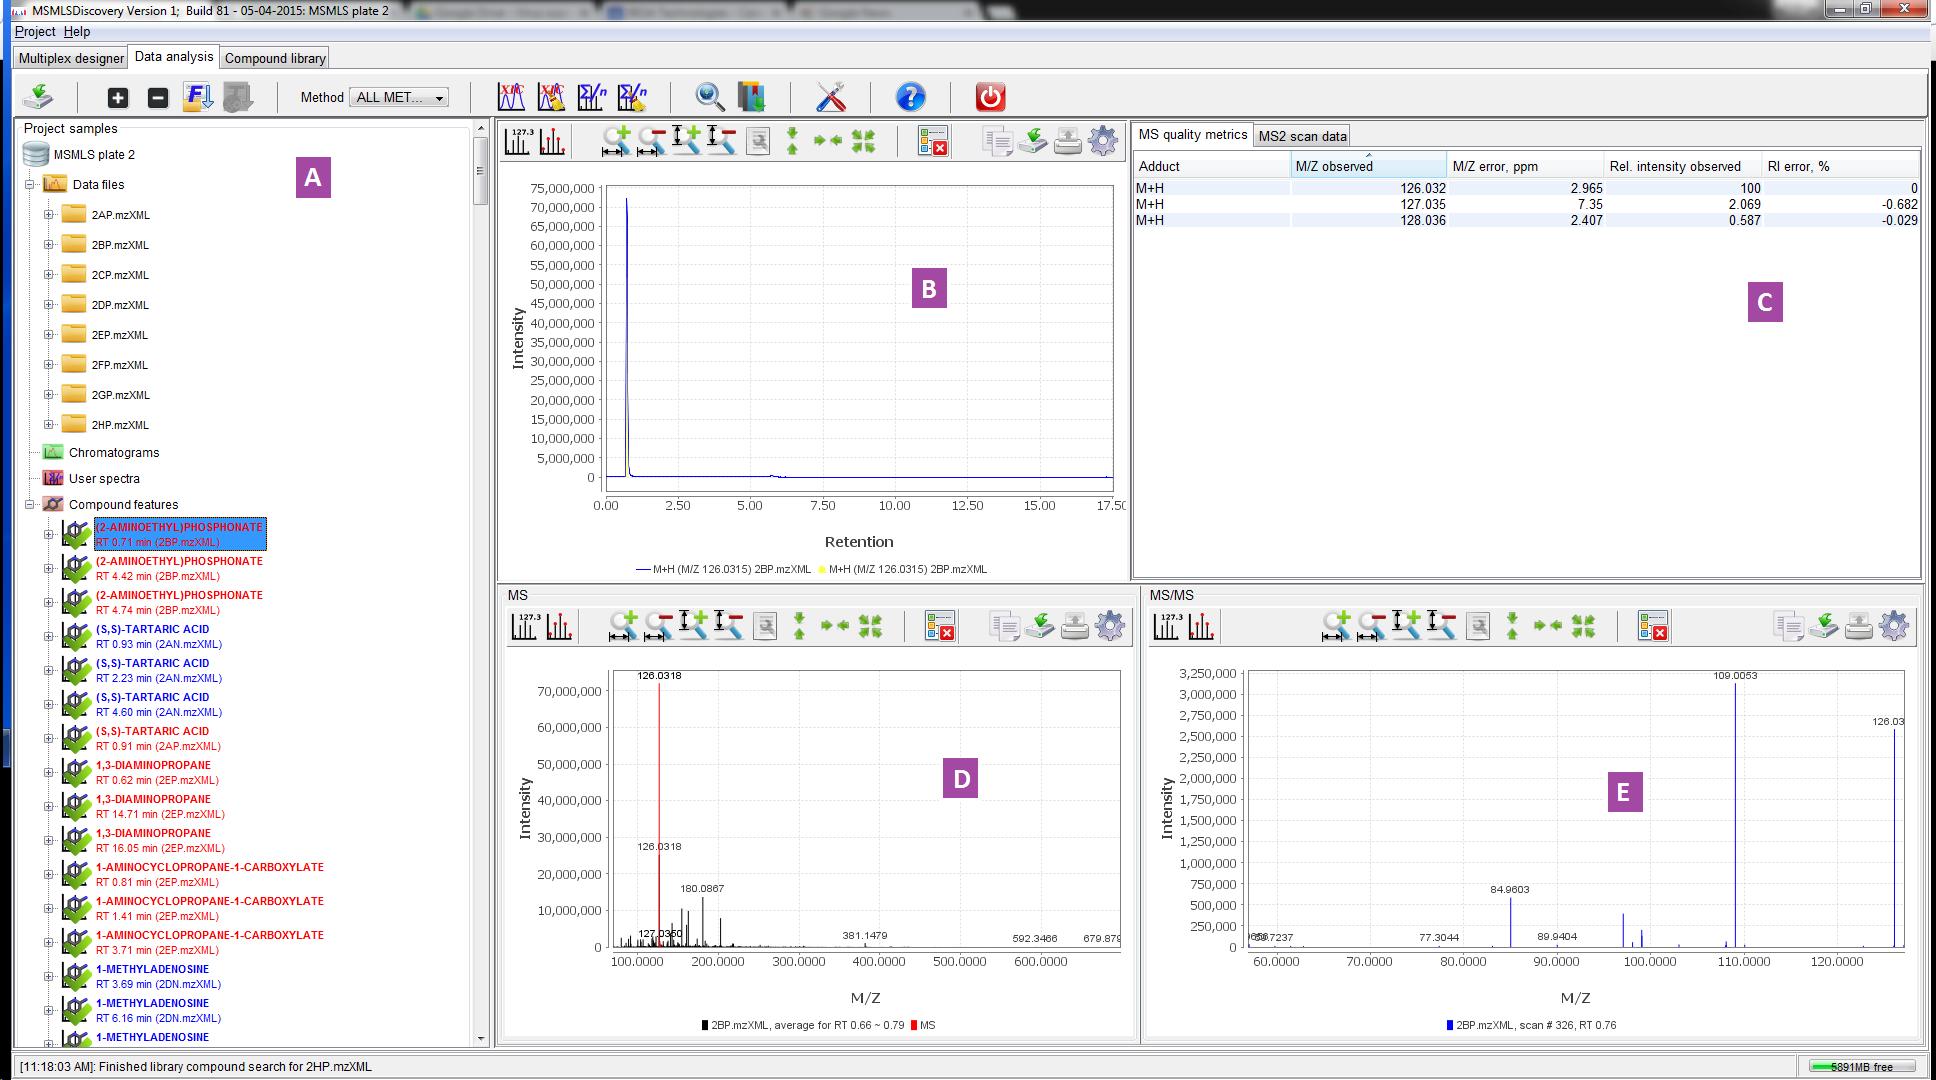 Data analysis panel